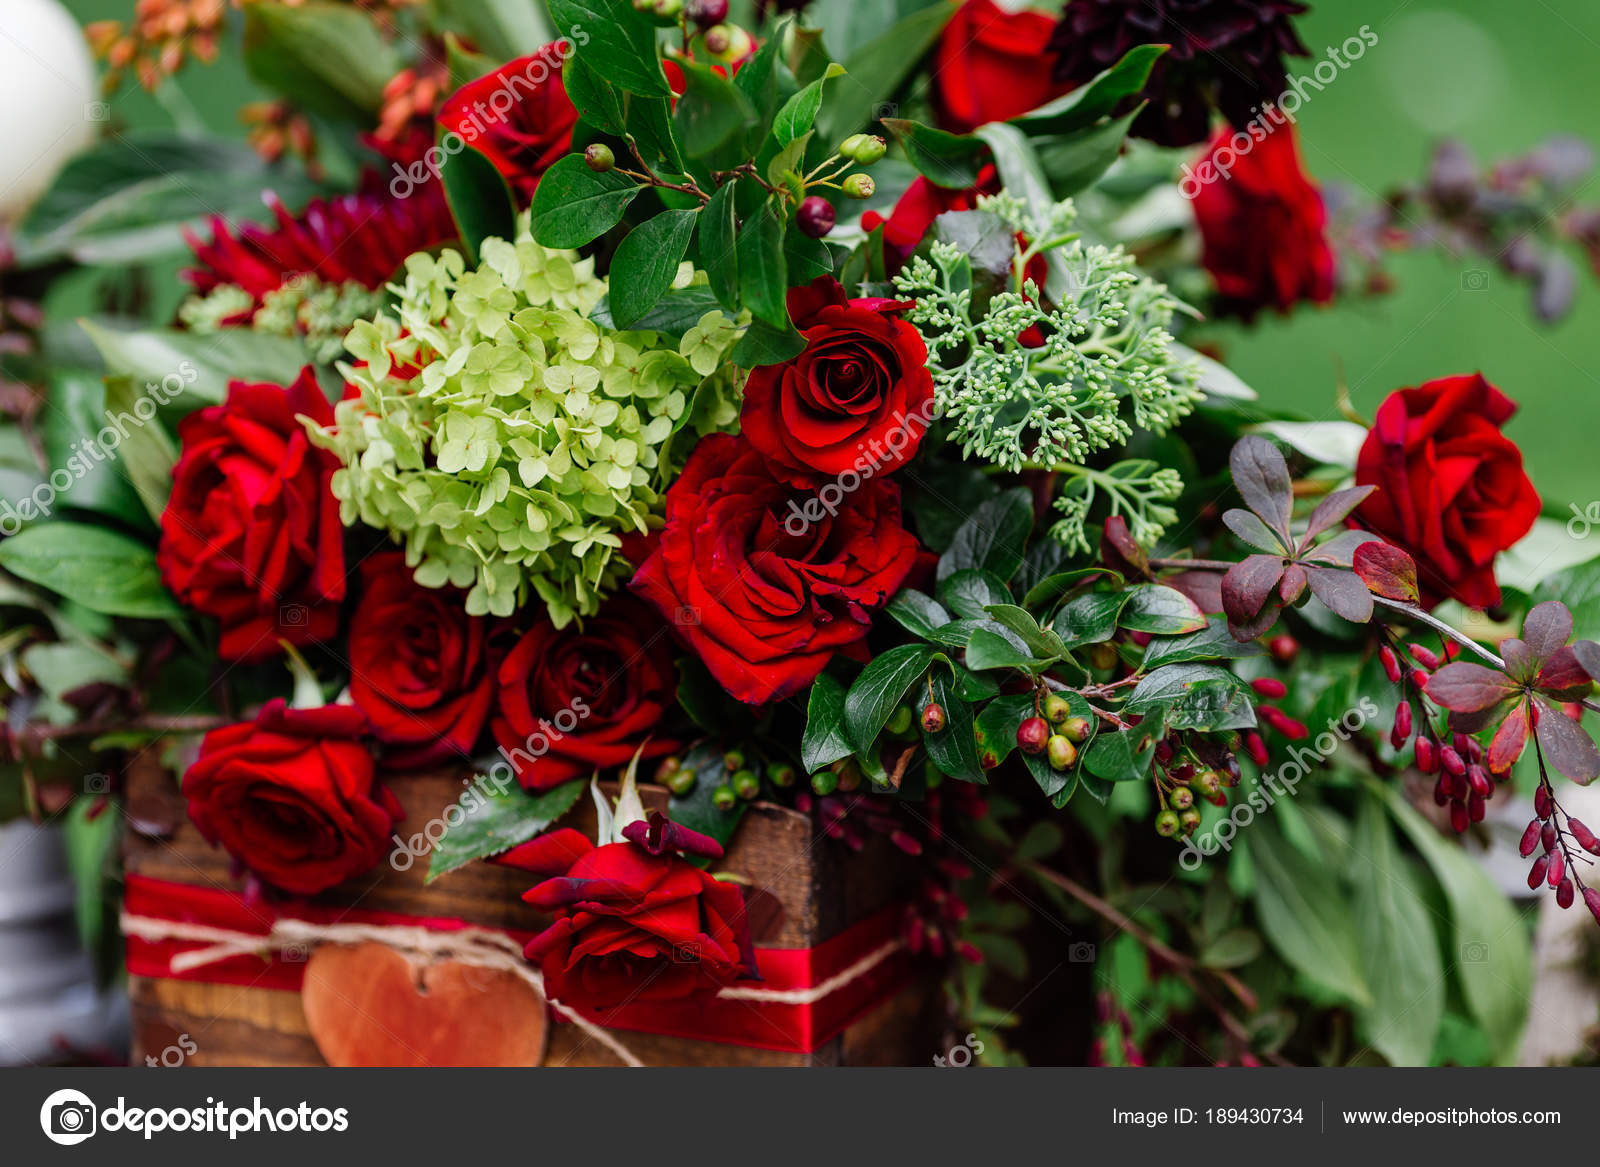 4788ba0bade0 Γάμος διακόσμηση Πίνακας  λουλούδια σύνθεση με τριαντάφυλλα